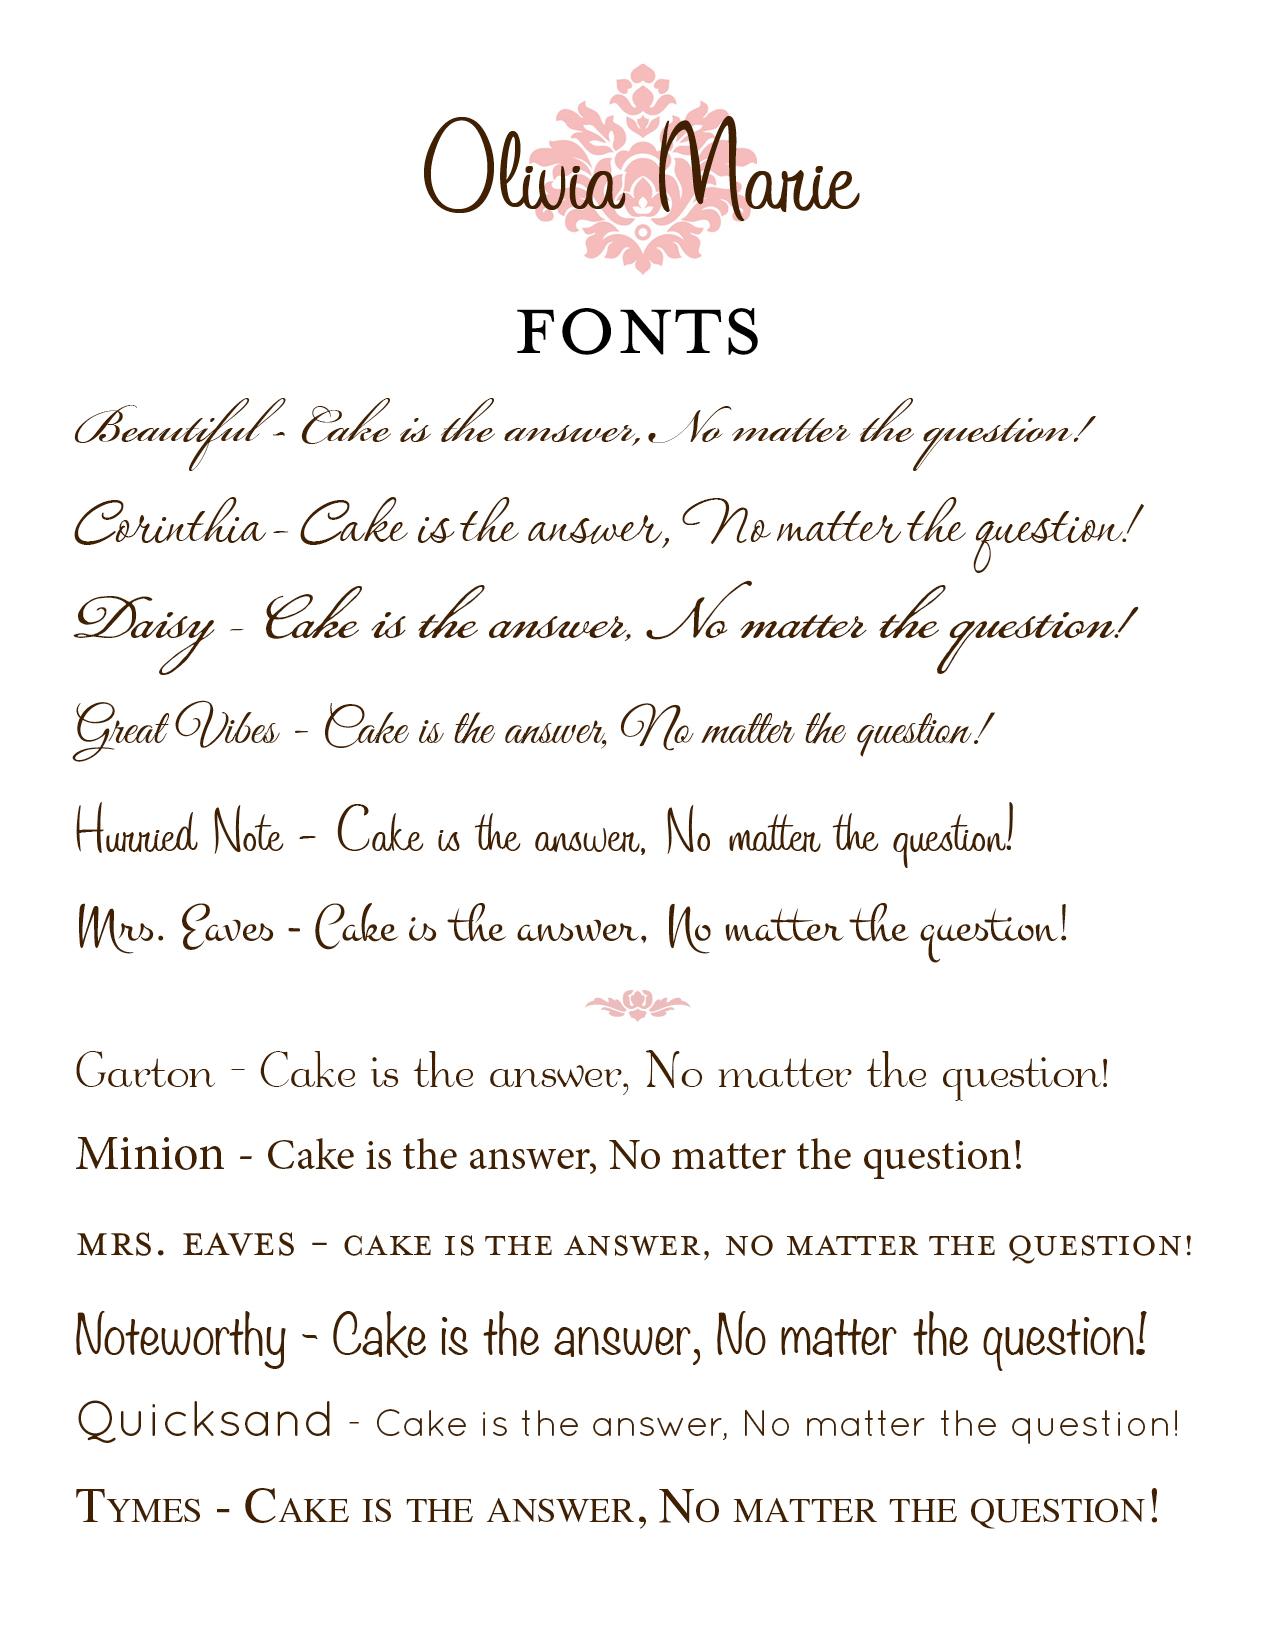 Olivia Marie Font Types.jpg